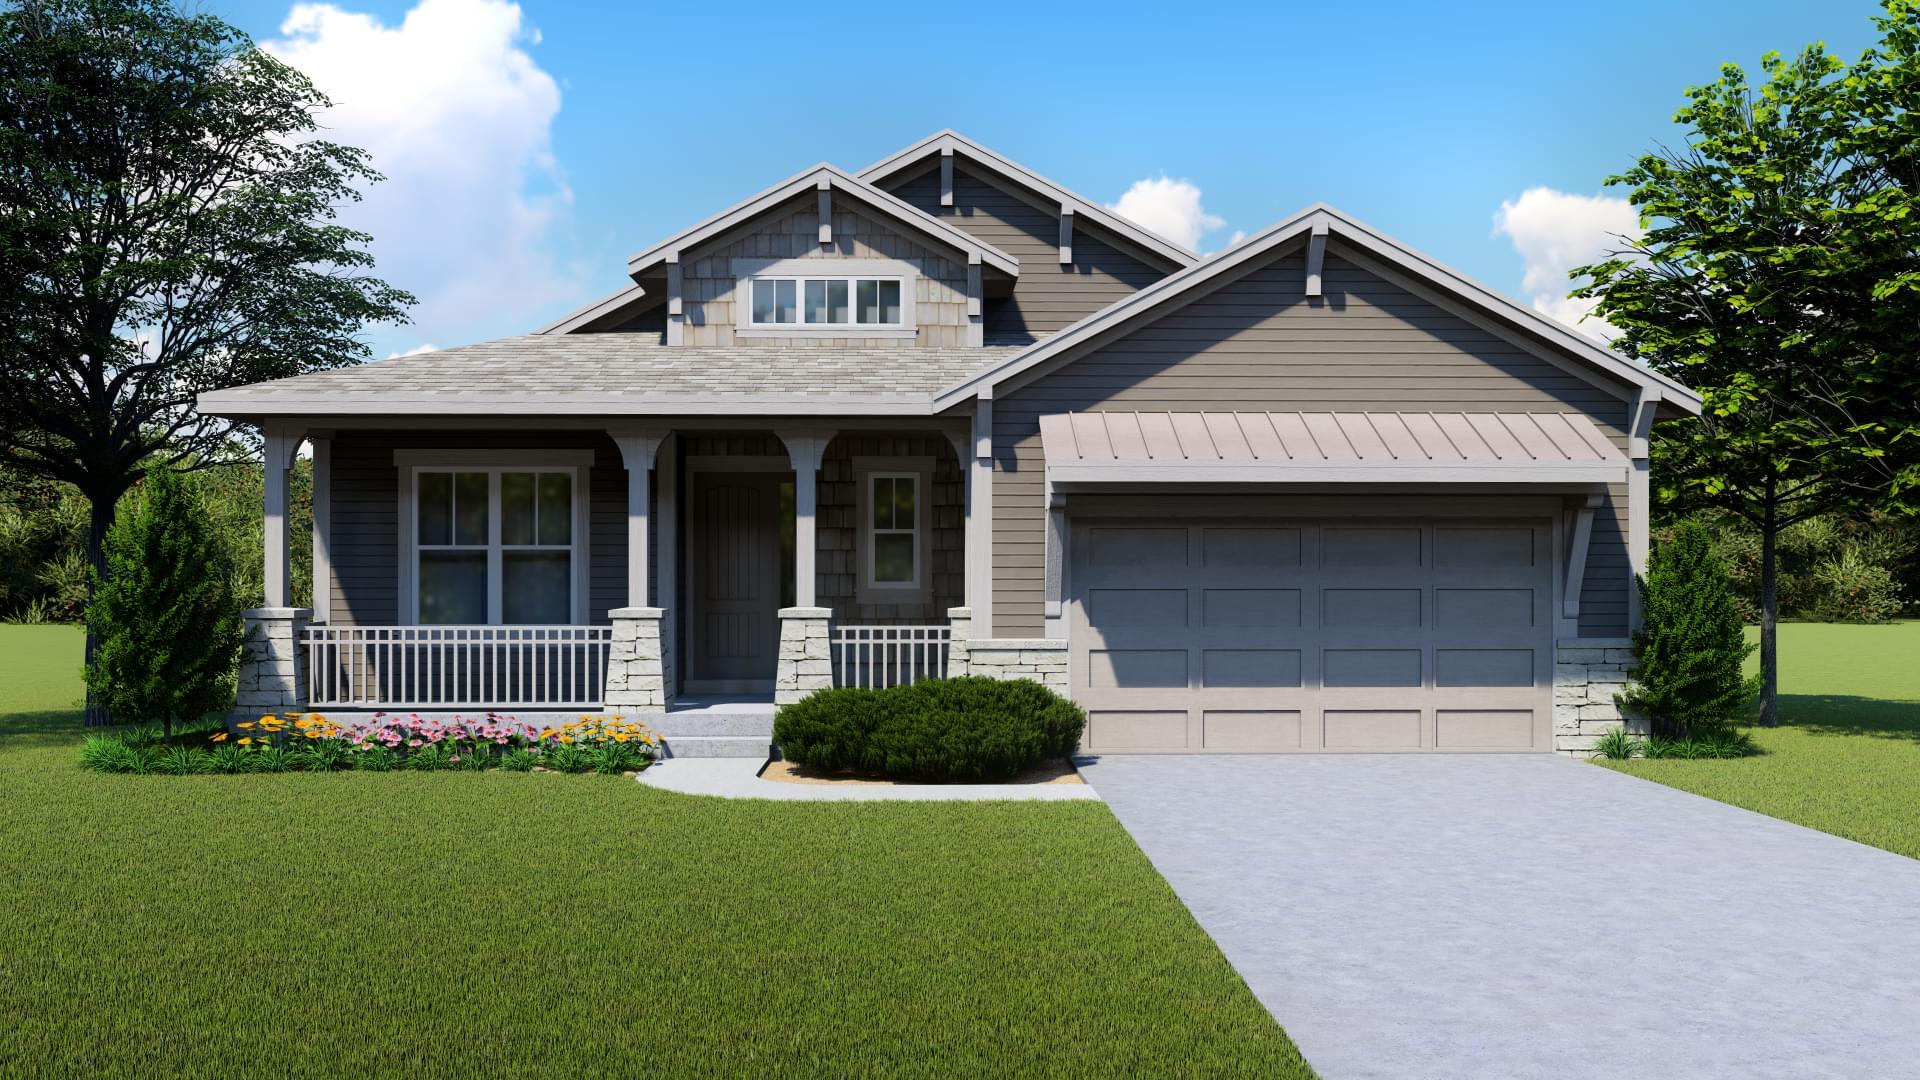 Edora Craftsman 1. 1,876sf New Home in Windsor, CO